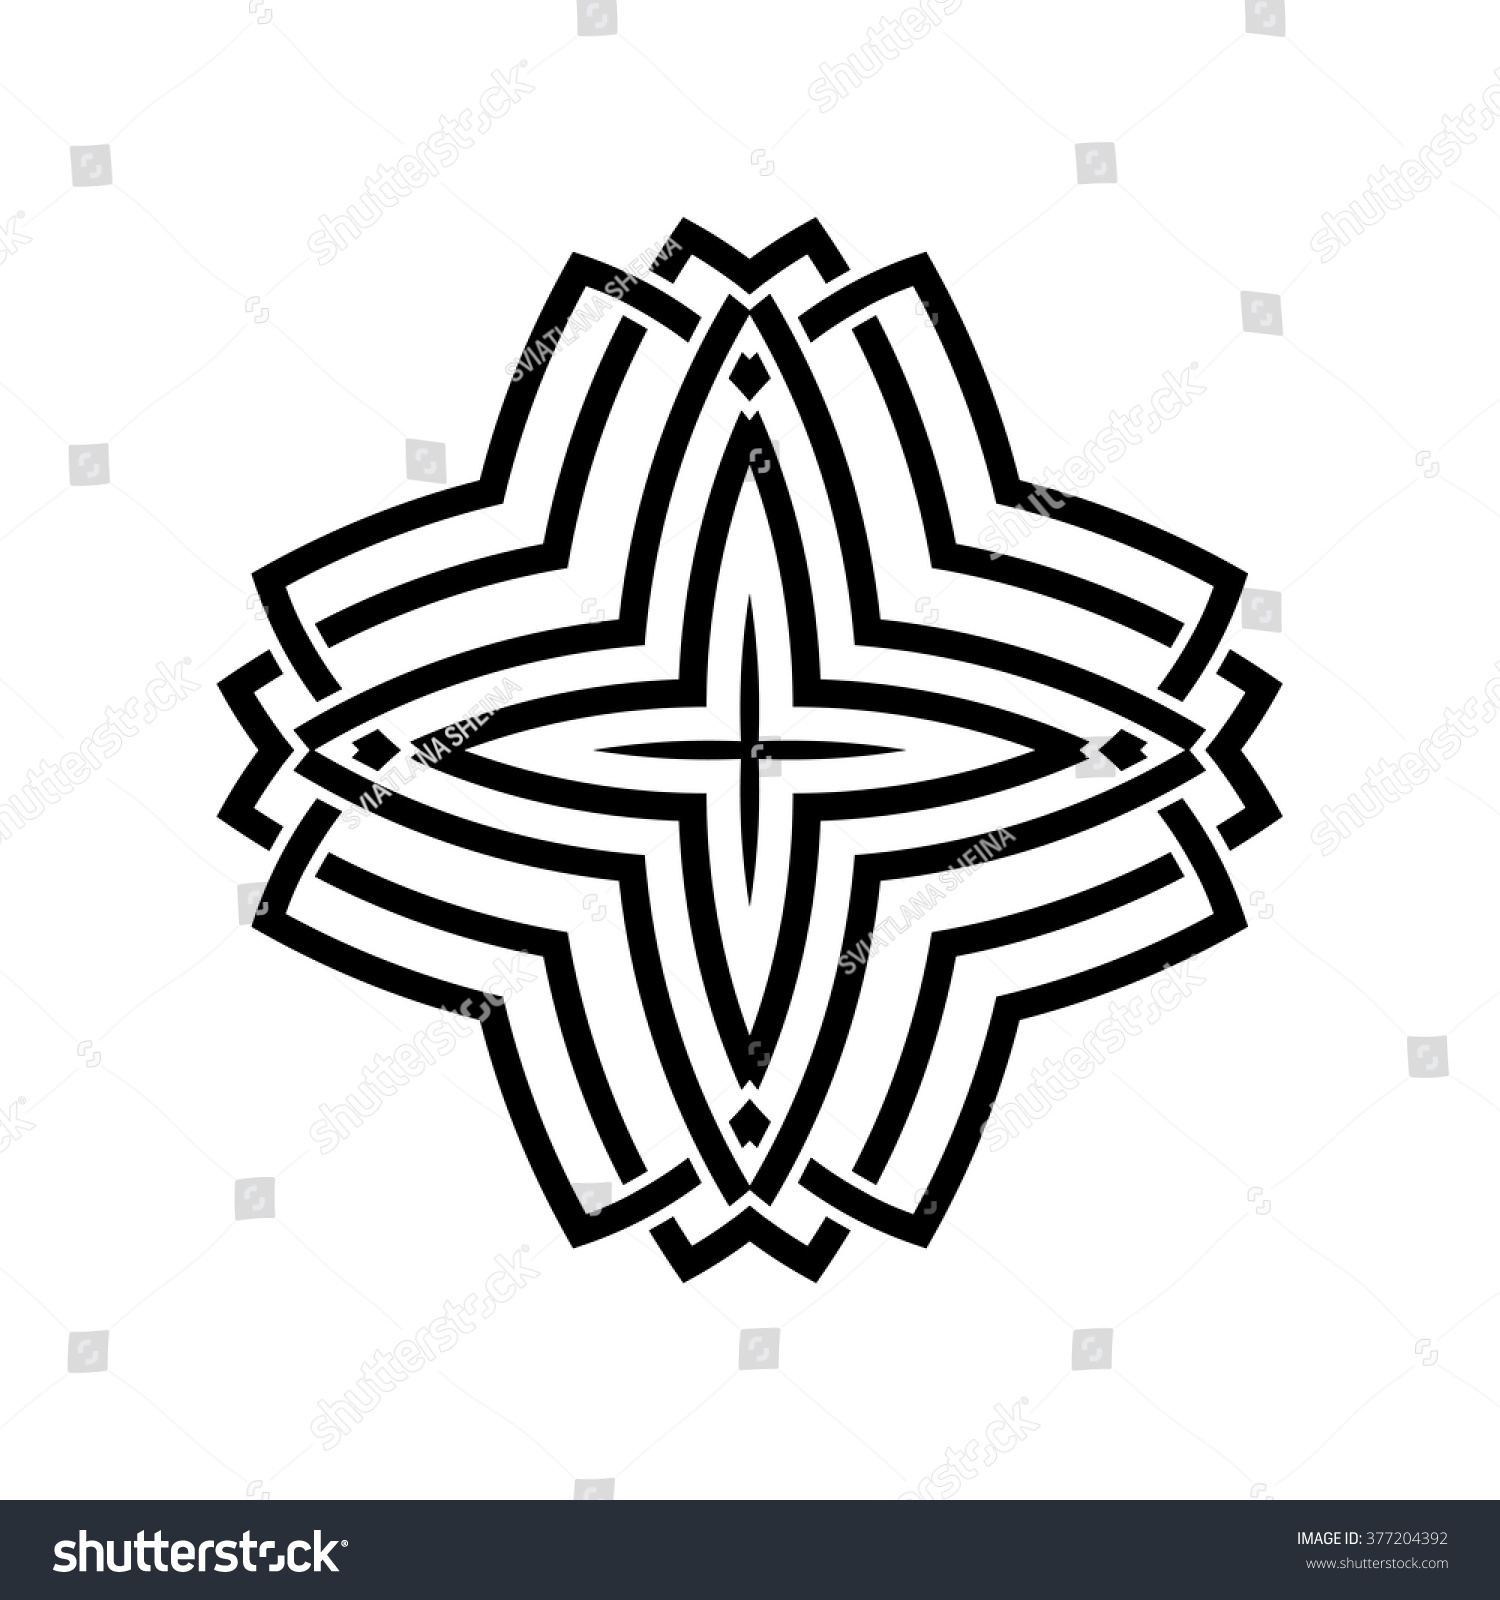 geometric oriental arabic pattern logo element stock vector royalty Potassium Element geometric oriental arabic pattern logo element for your design